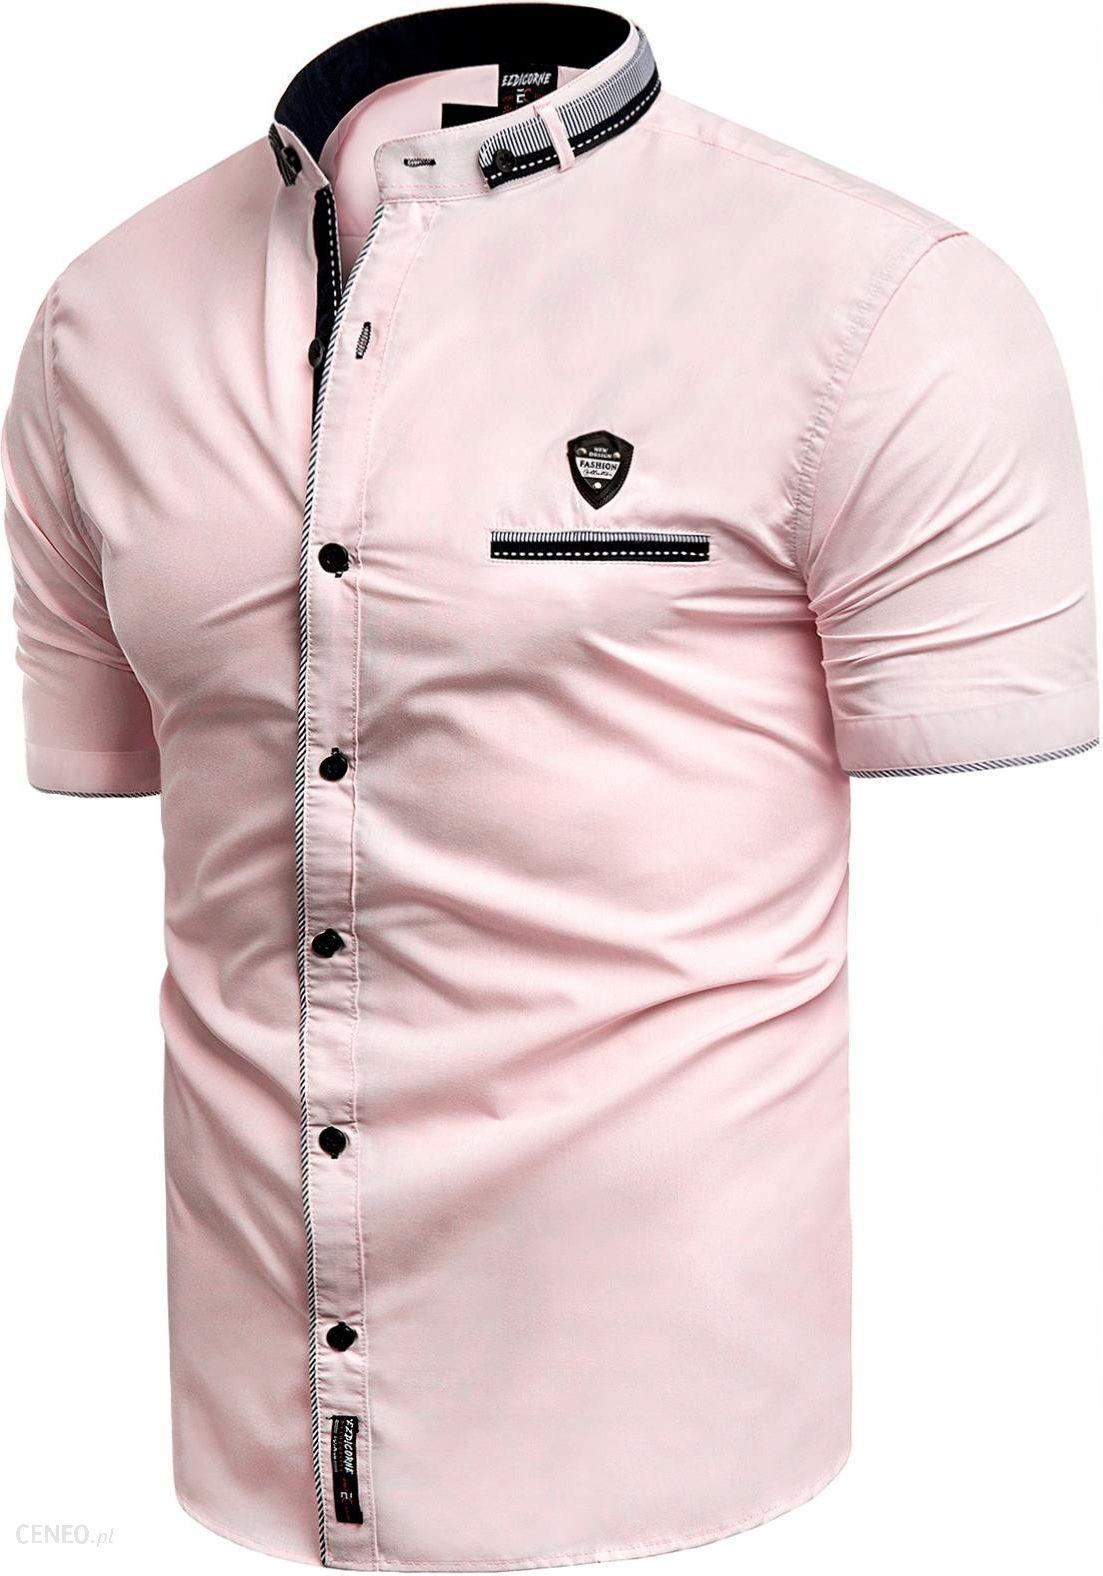 M Koszula Męska Krótki Rękaw 19 617 A Regular Ceny i  m4Tpf